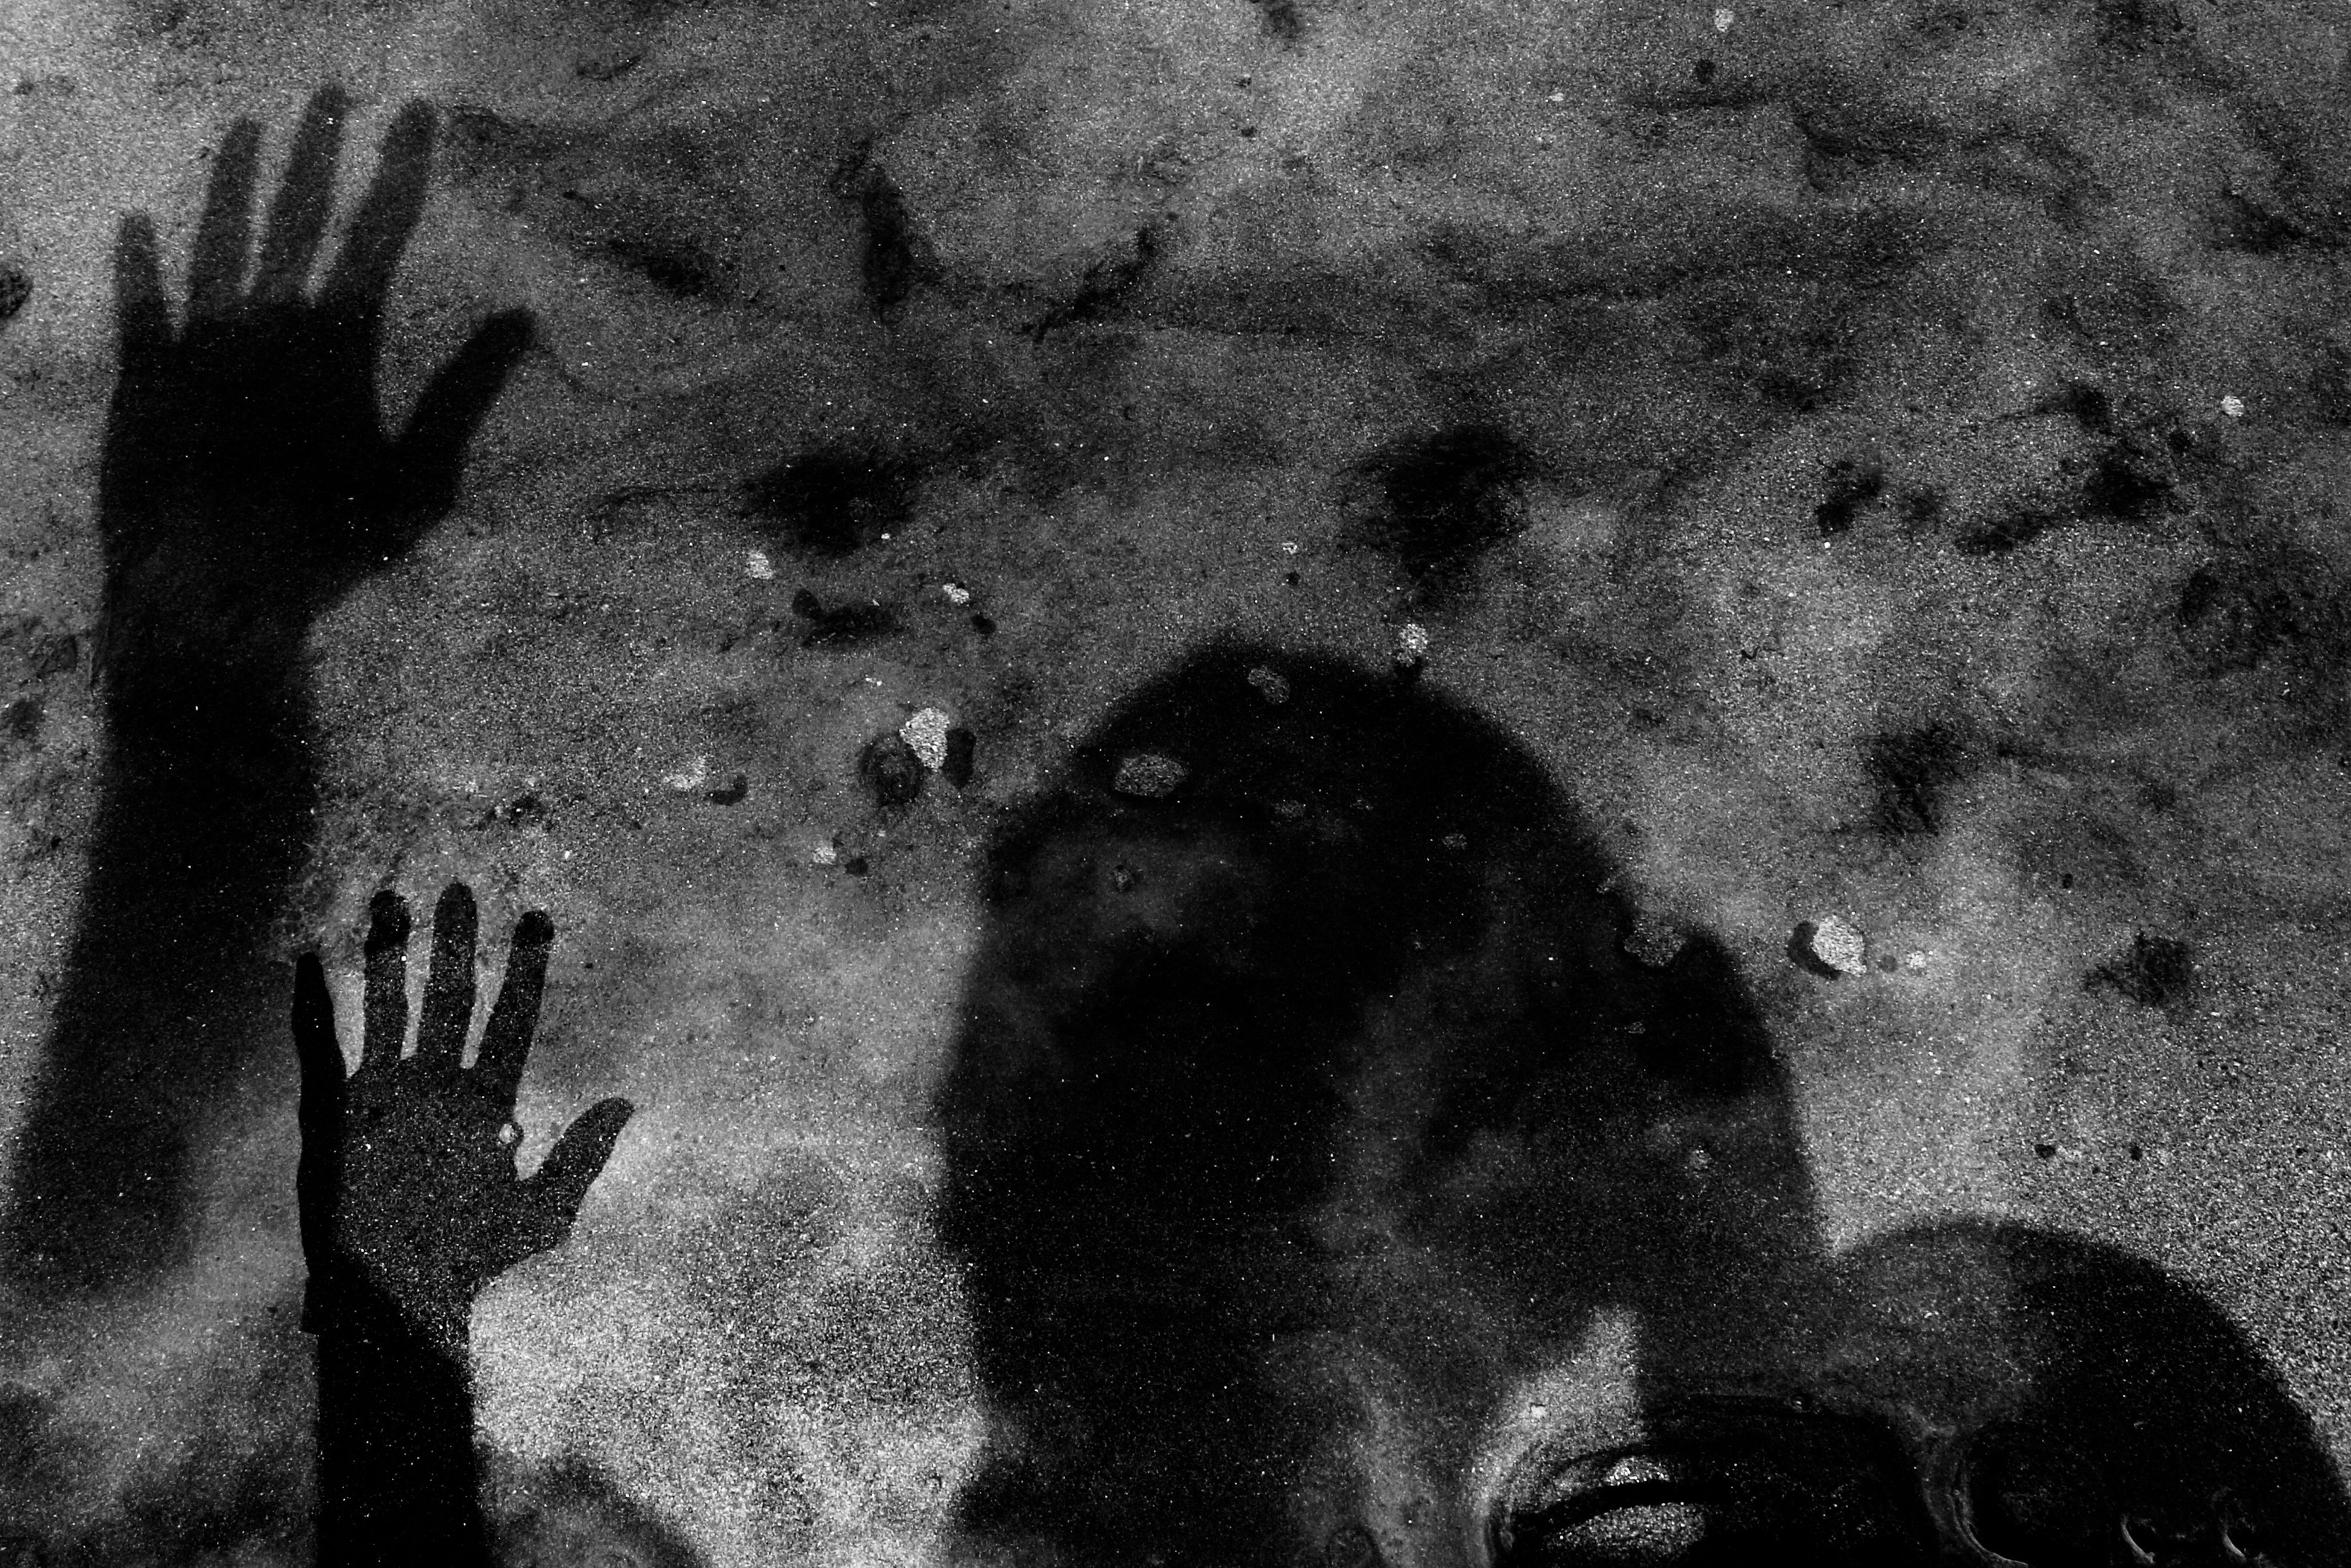 Reflet noir Black And White Black Blackandwhite Black & White Blackandwhite Photography Black And White Photography Black&white Noir Et Blanc Noiretblanc Sea Shadow Mazandaran Mazandaran Iran Iran